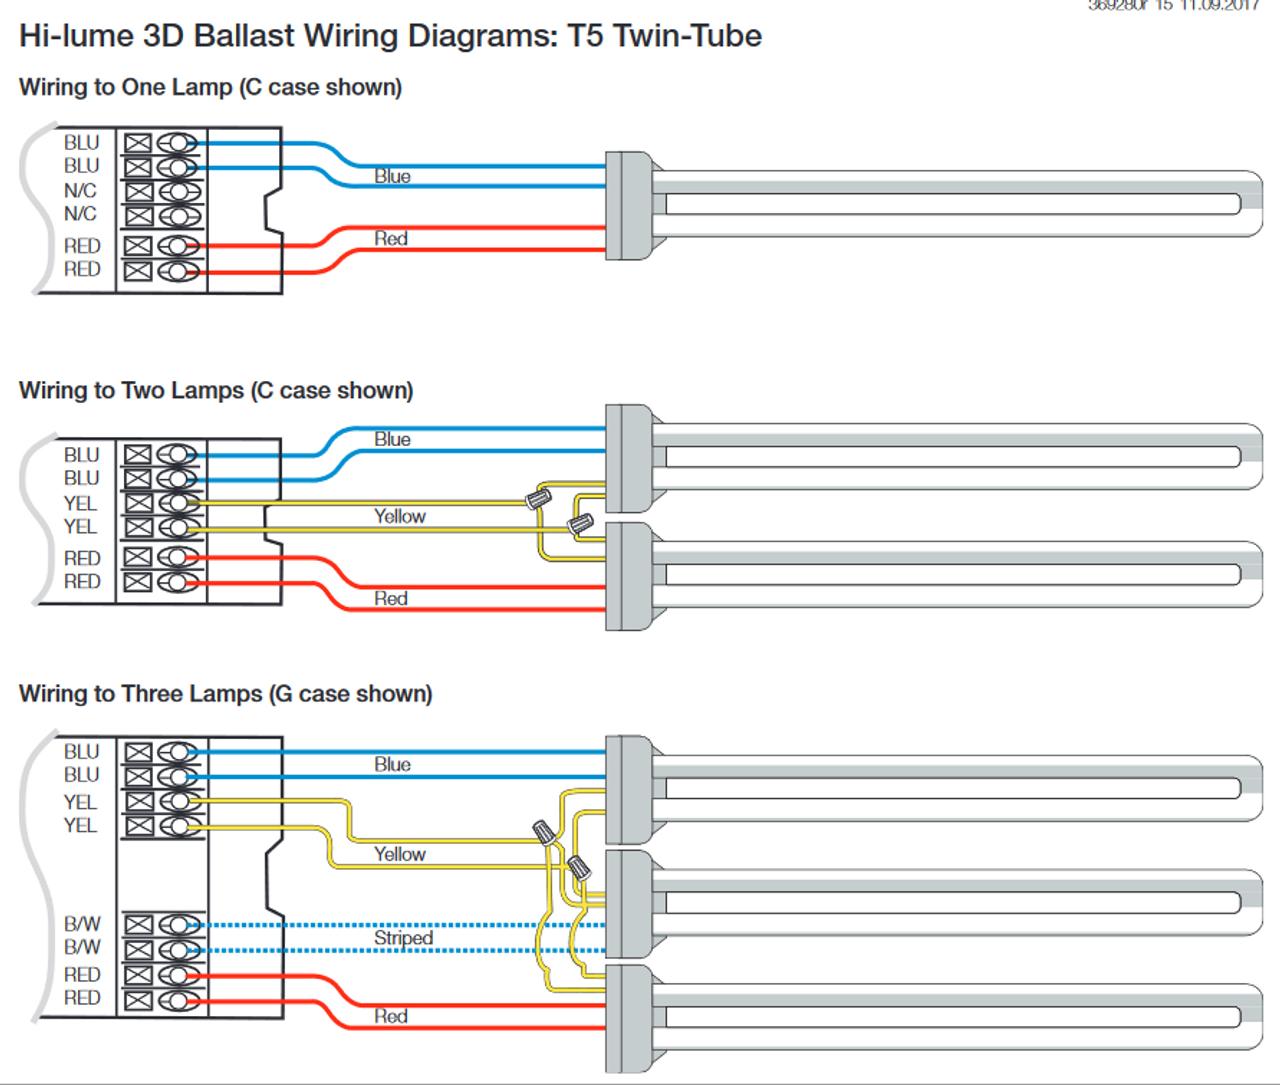 H3DT540GU210 (EC3T540GU210) Lutron Hi-Lume 3D Dimming Ballast on